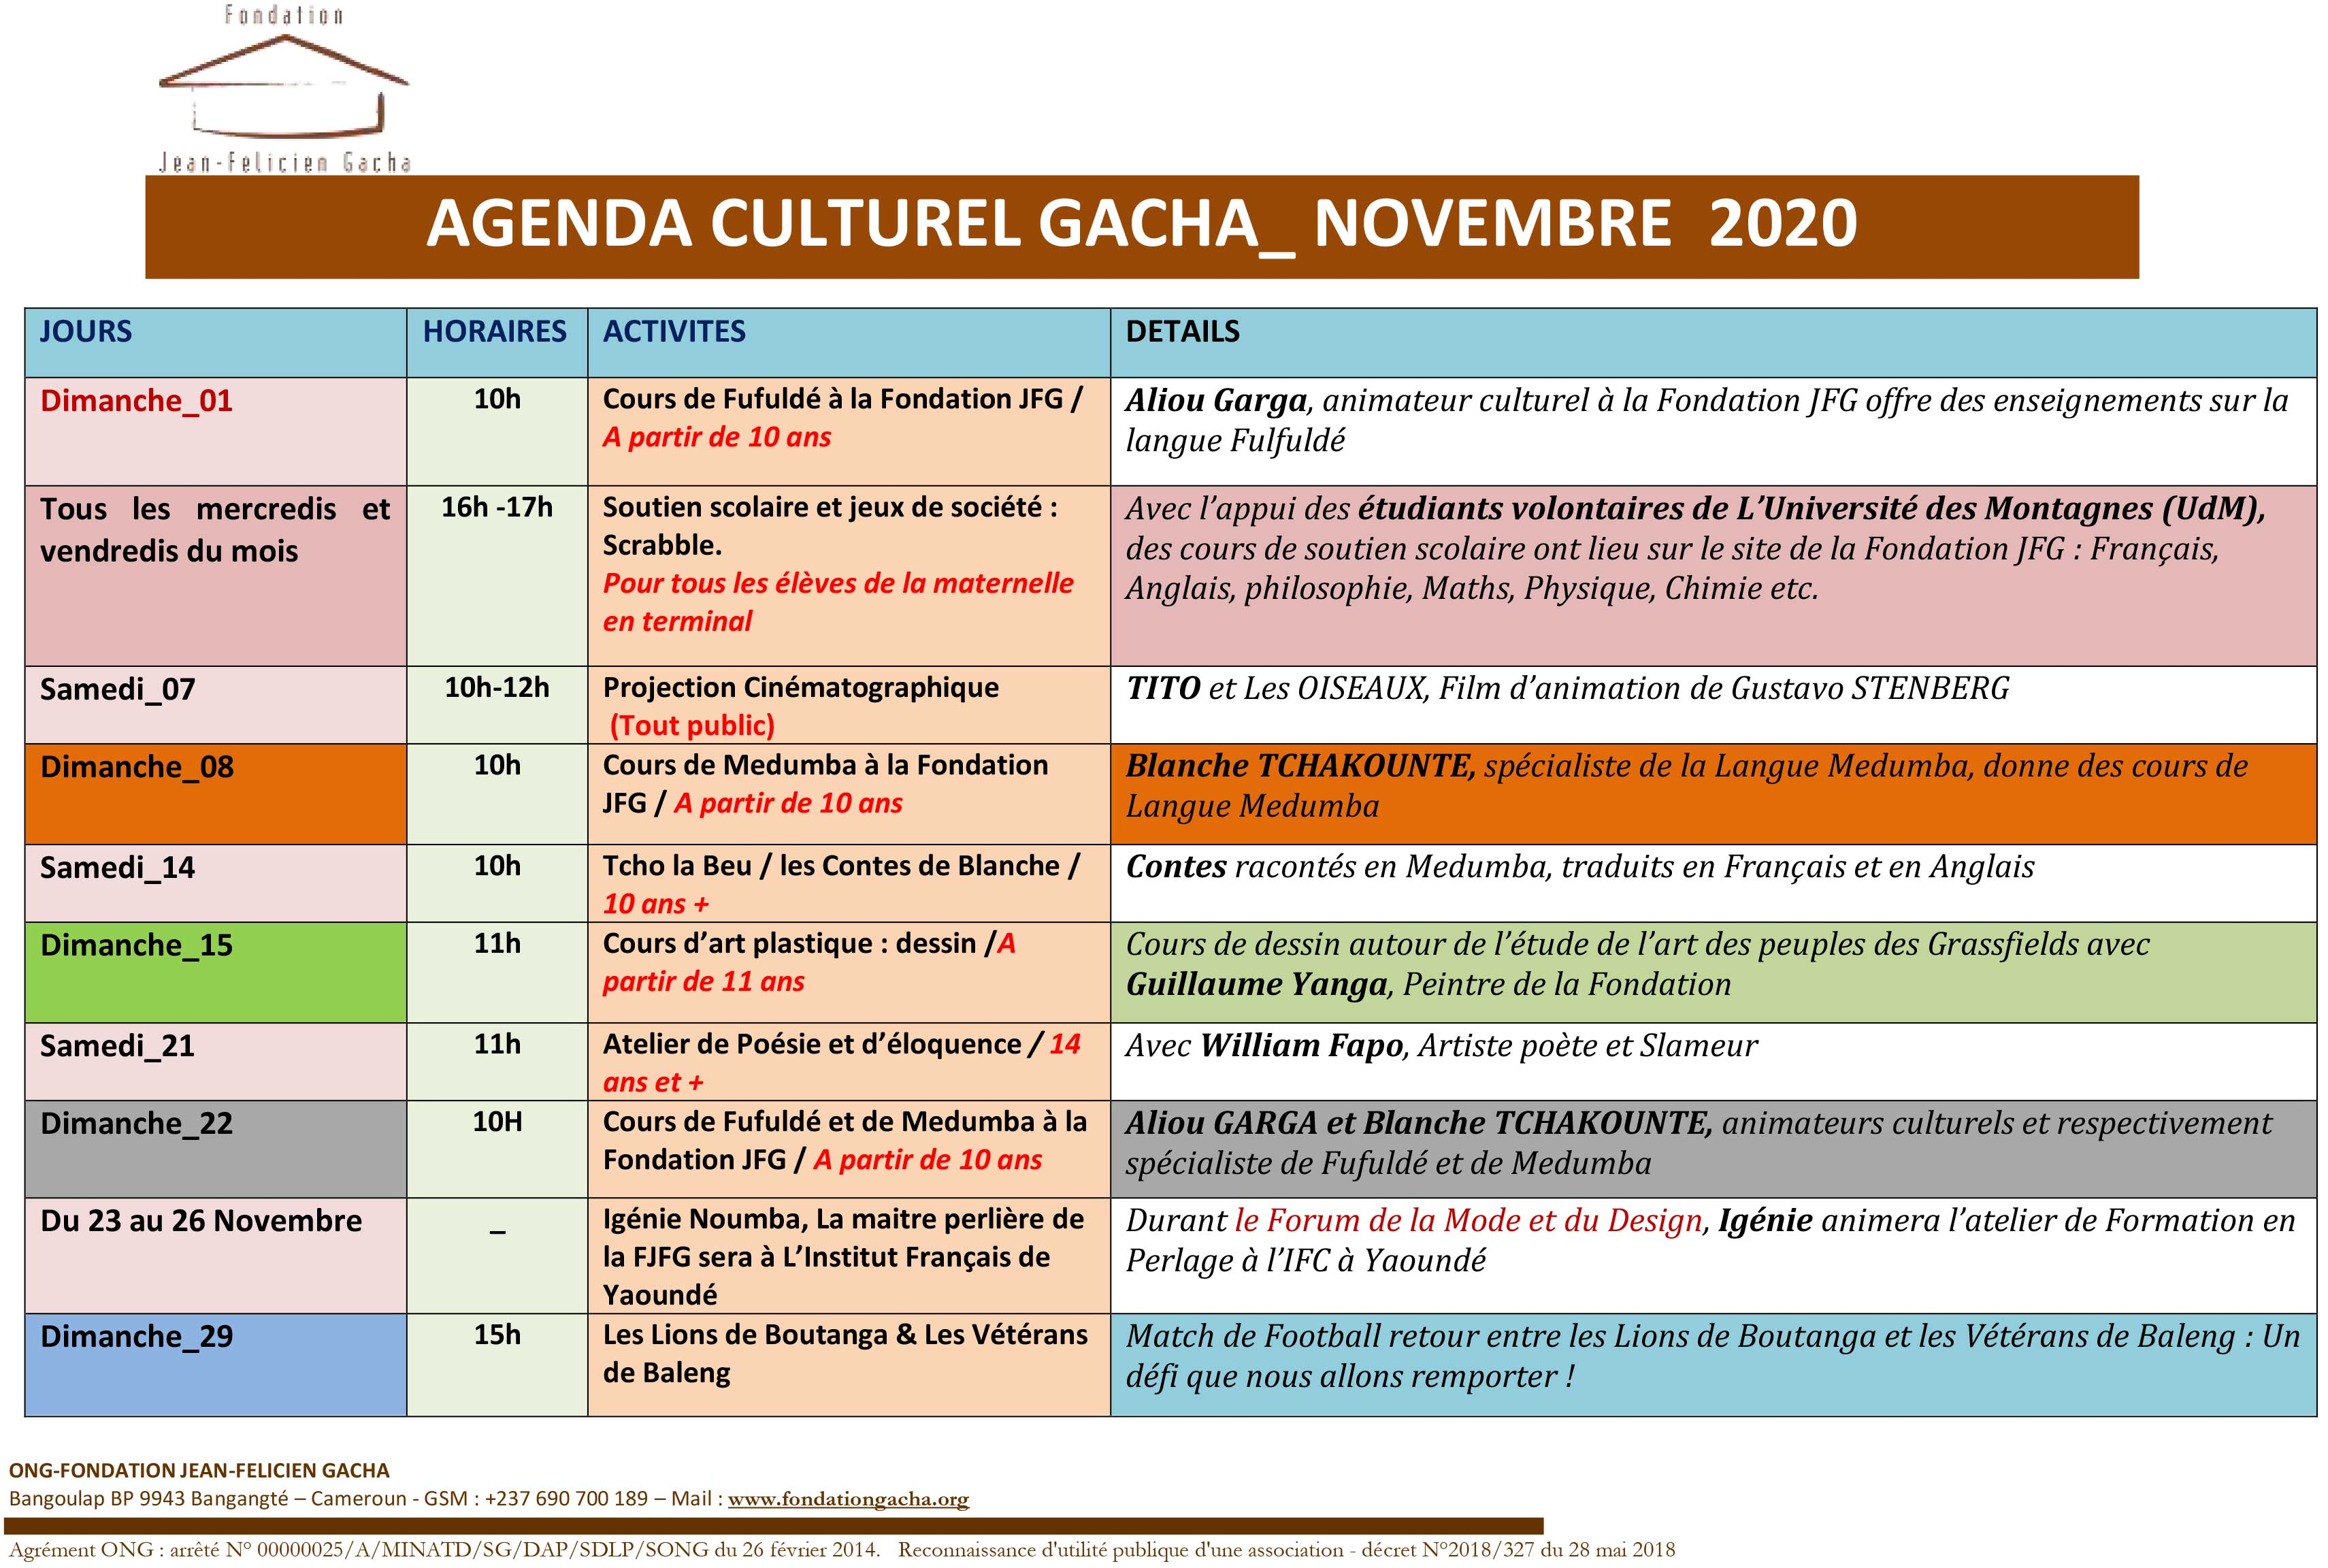 AGENDA CULTUREL DU MOIS DE NOVEMBRE 2020